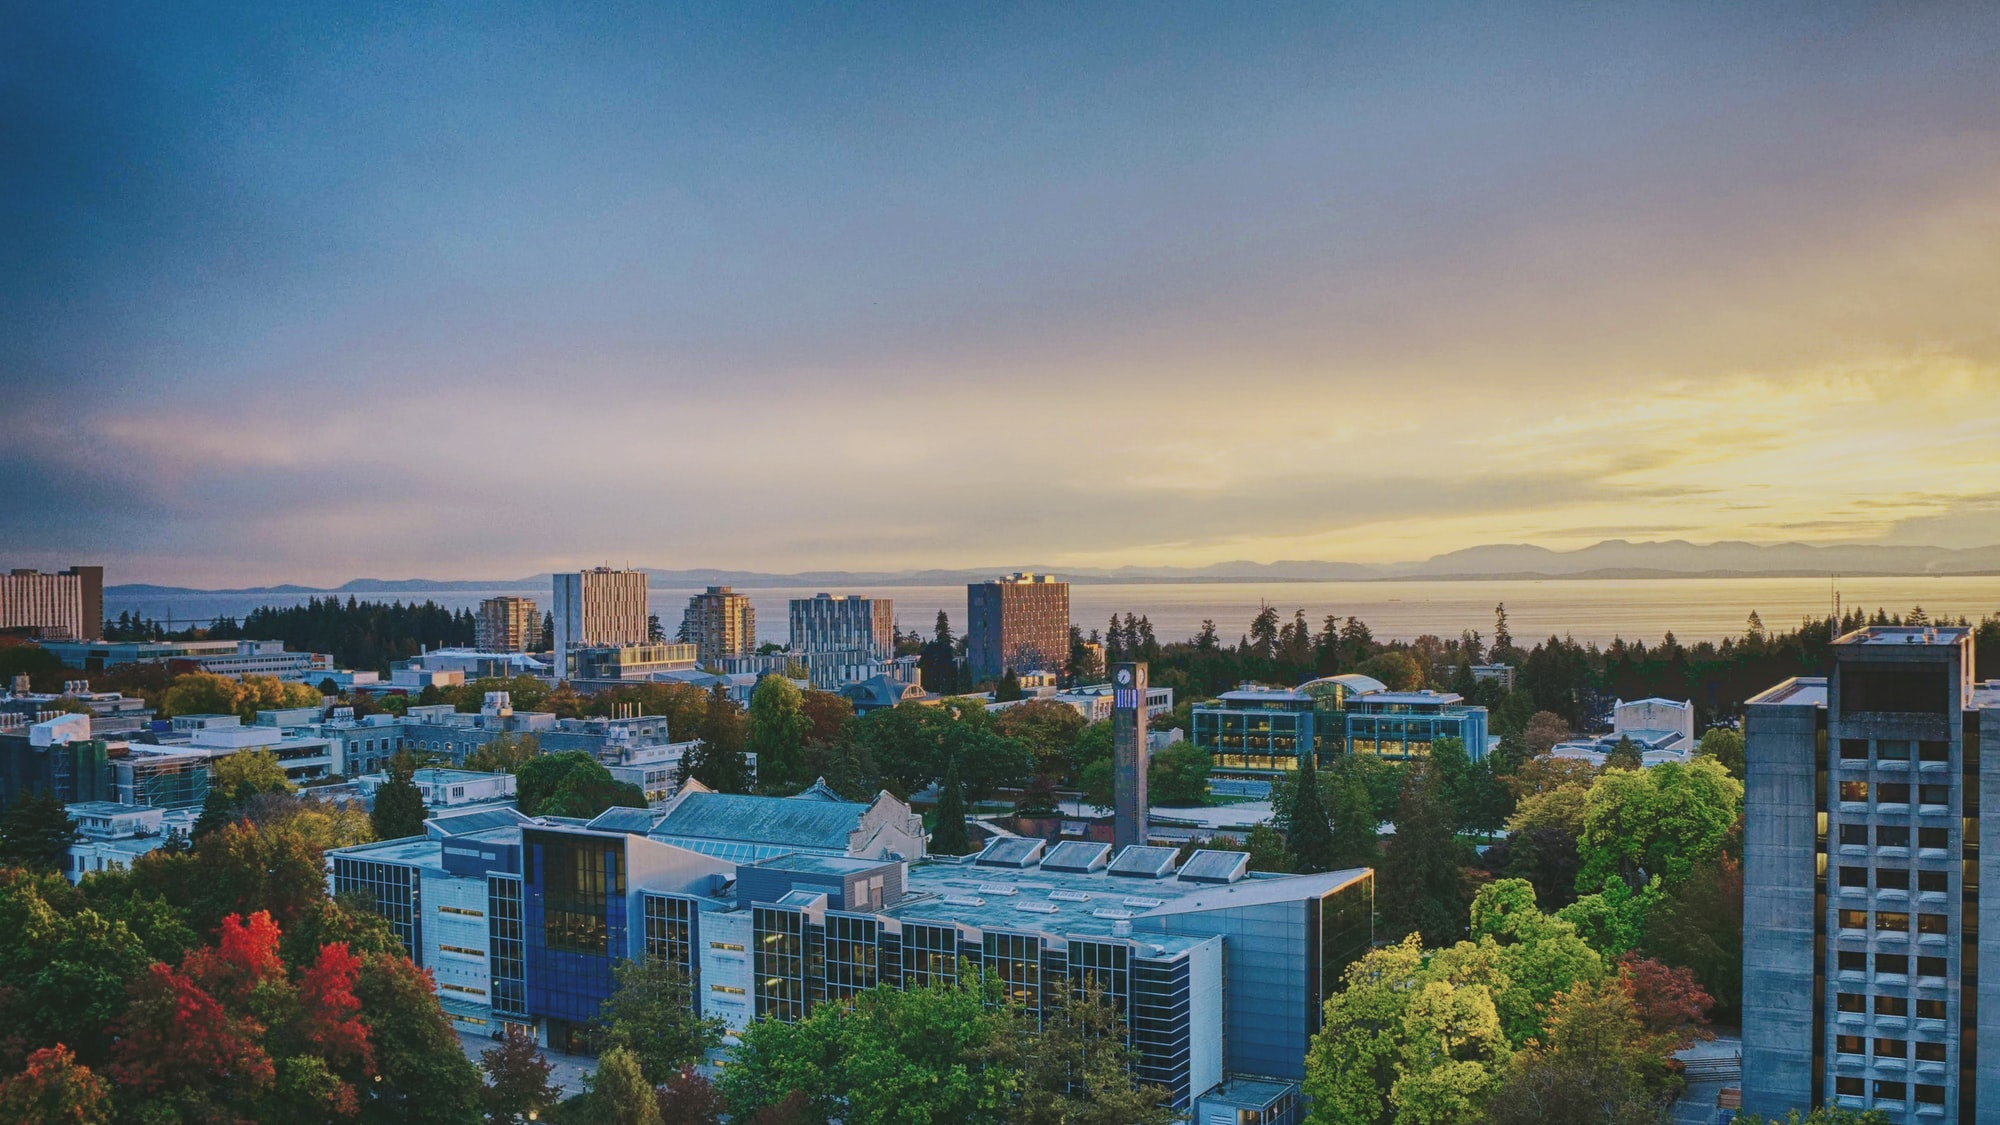 UBC campus, looking towards the Strait of Georgia